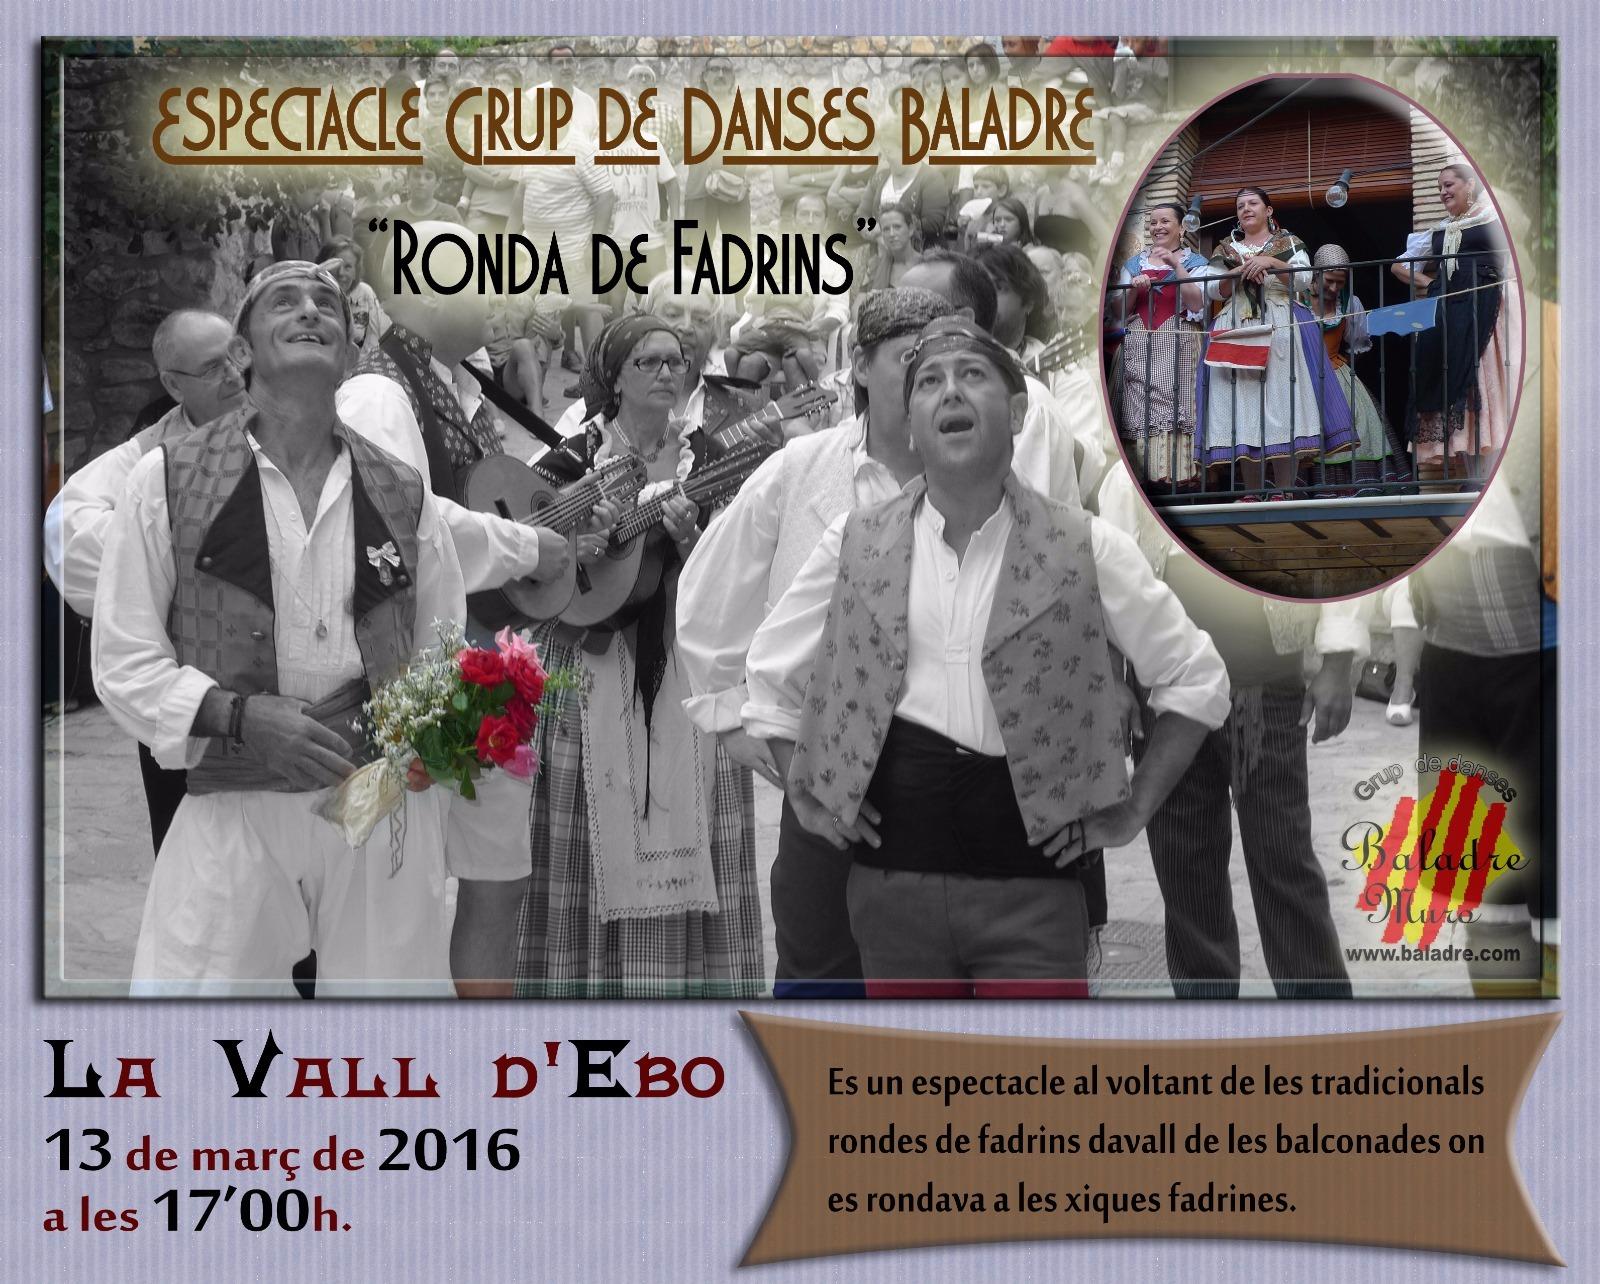 20160219065030 (1)